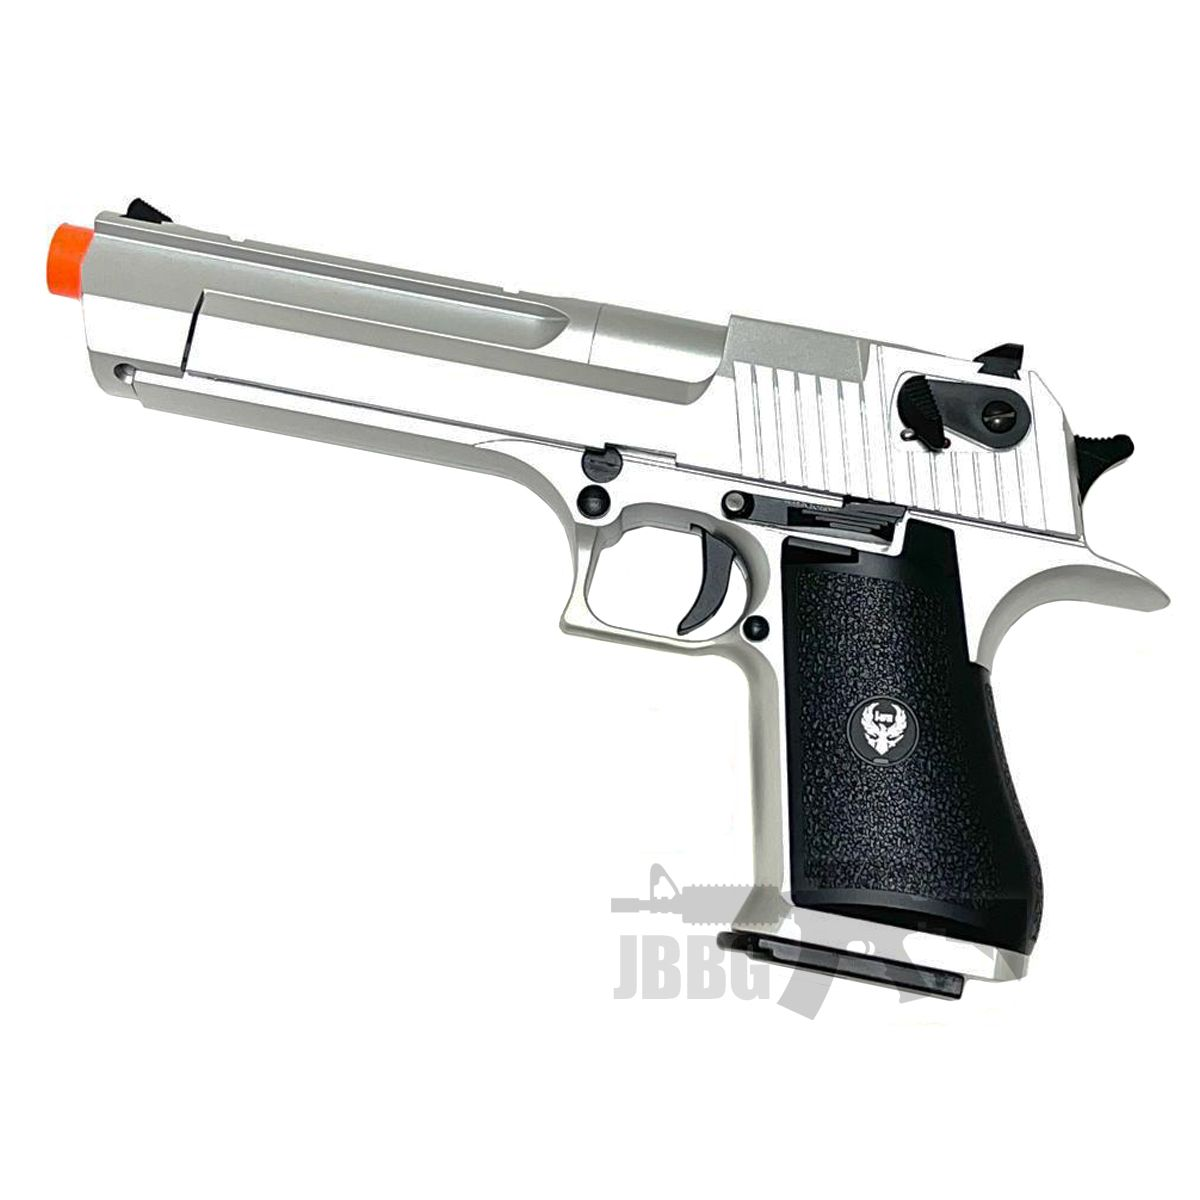 HFC HG195 Desert Eagle Gas Powered Blowback Airsoft Pistol (Copy)